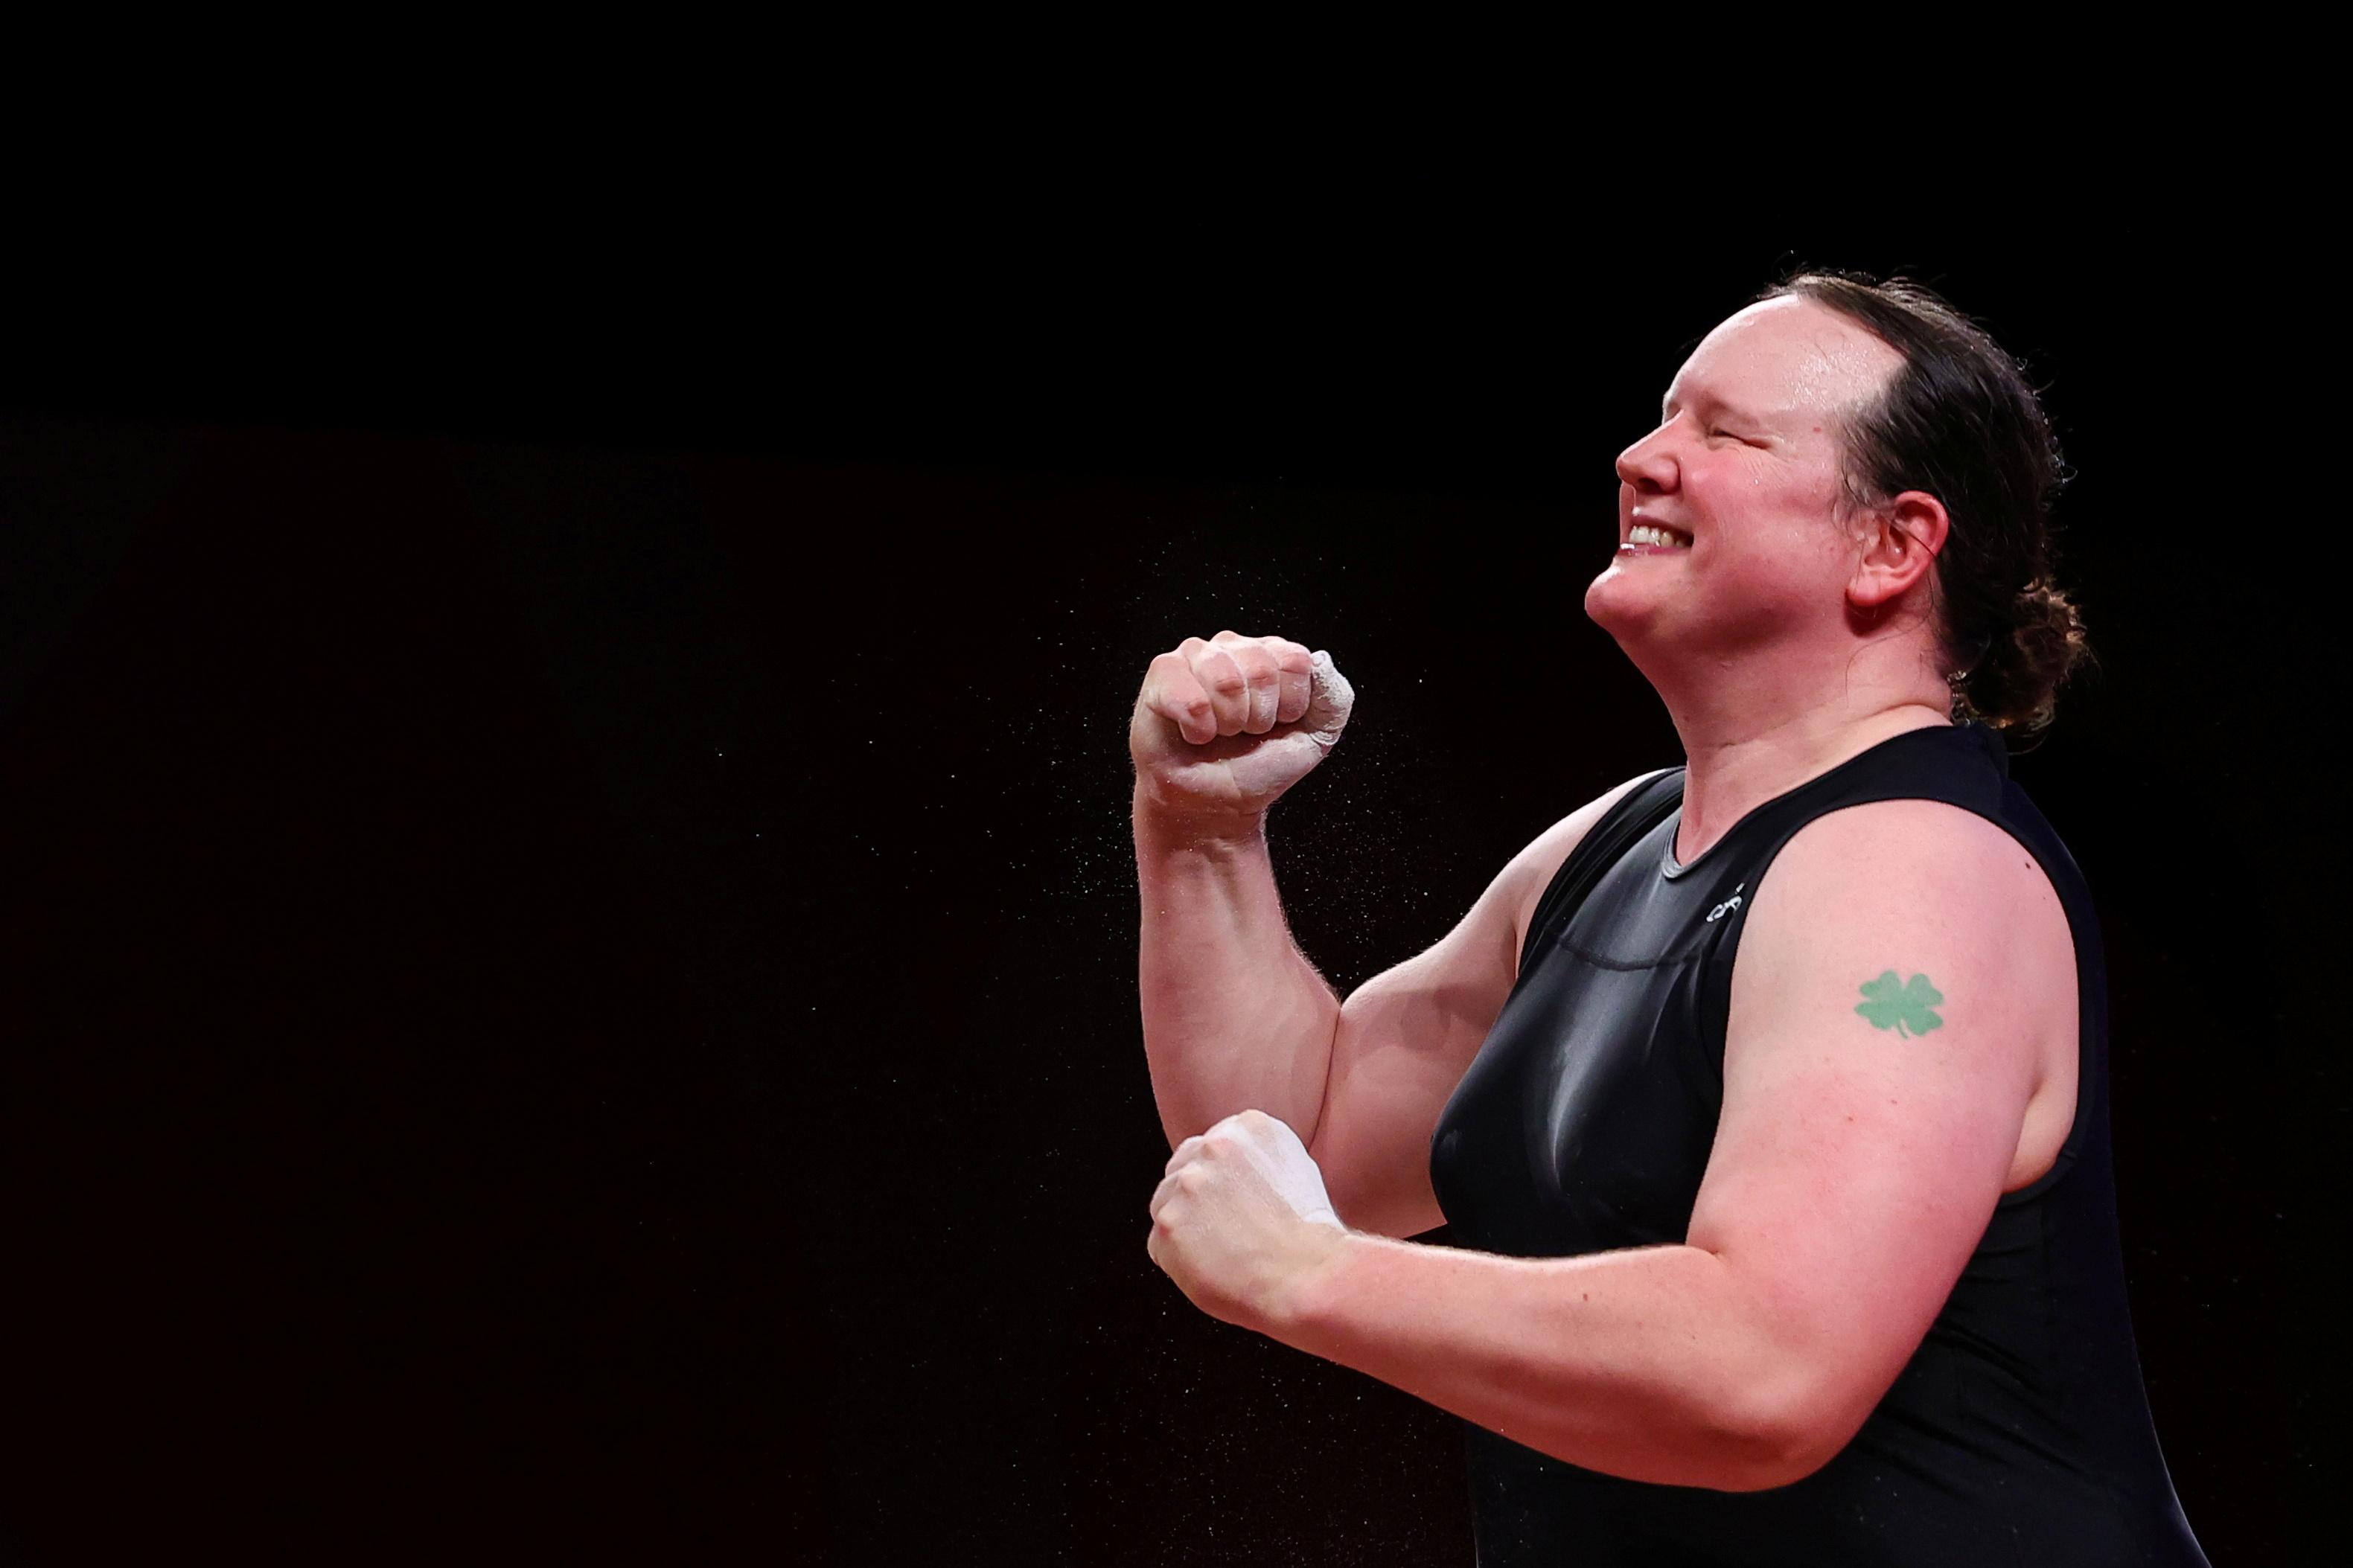 Tokyo 2020 Olympics - Weightlifting - Women's +87kg - Group A - Tokyo International Forum, Tokyo, Japan - August 2, 2021. Laurel Hubbard of New Zealand celebrates after a lift. REUTERS/Edgard Garrido